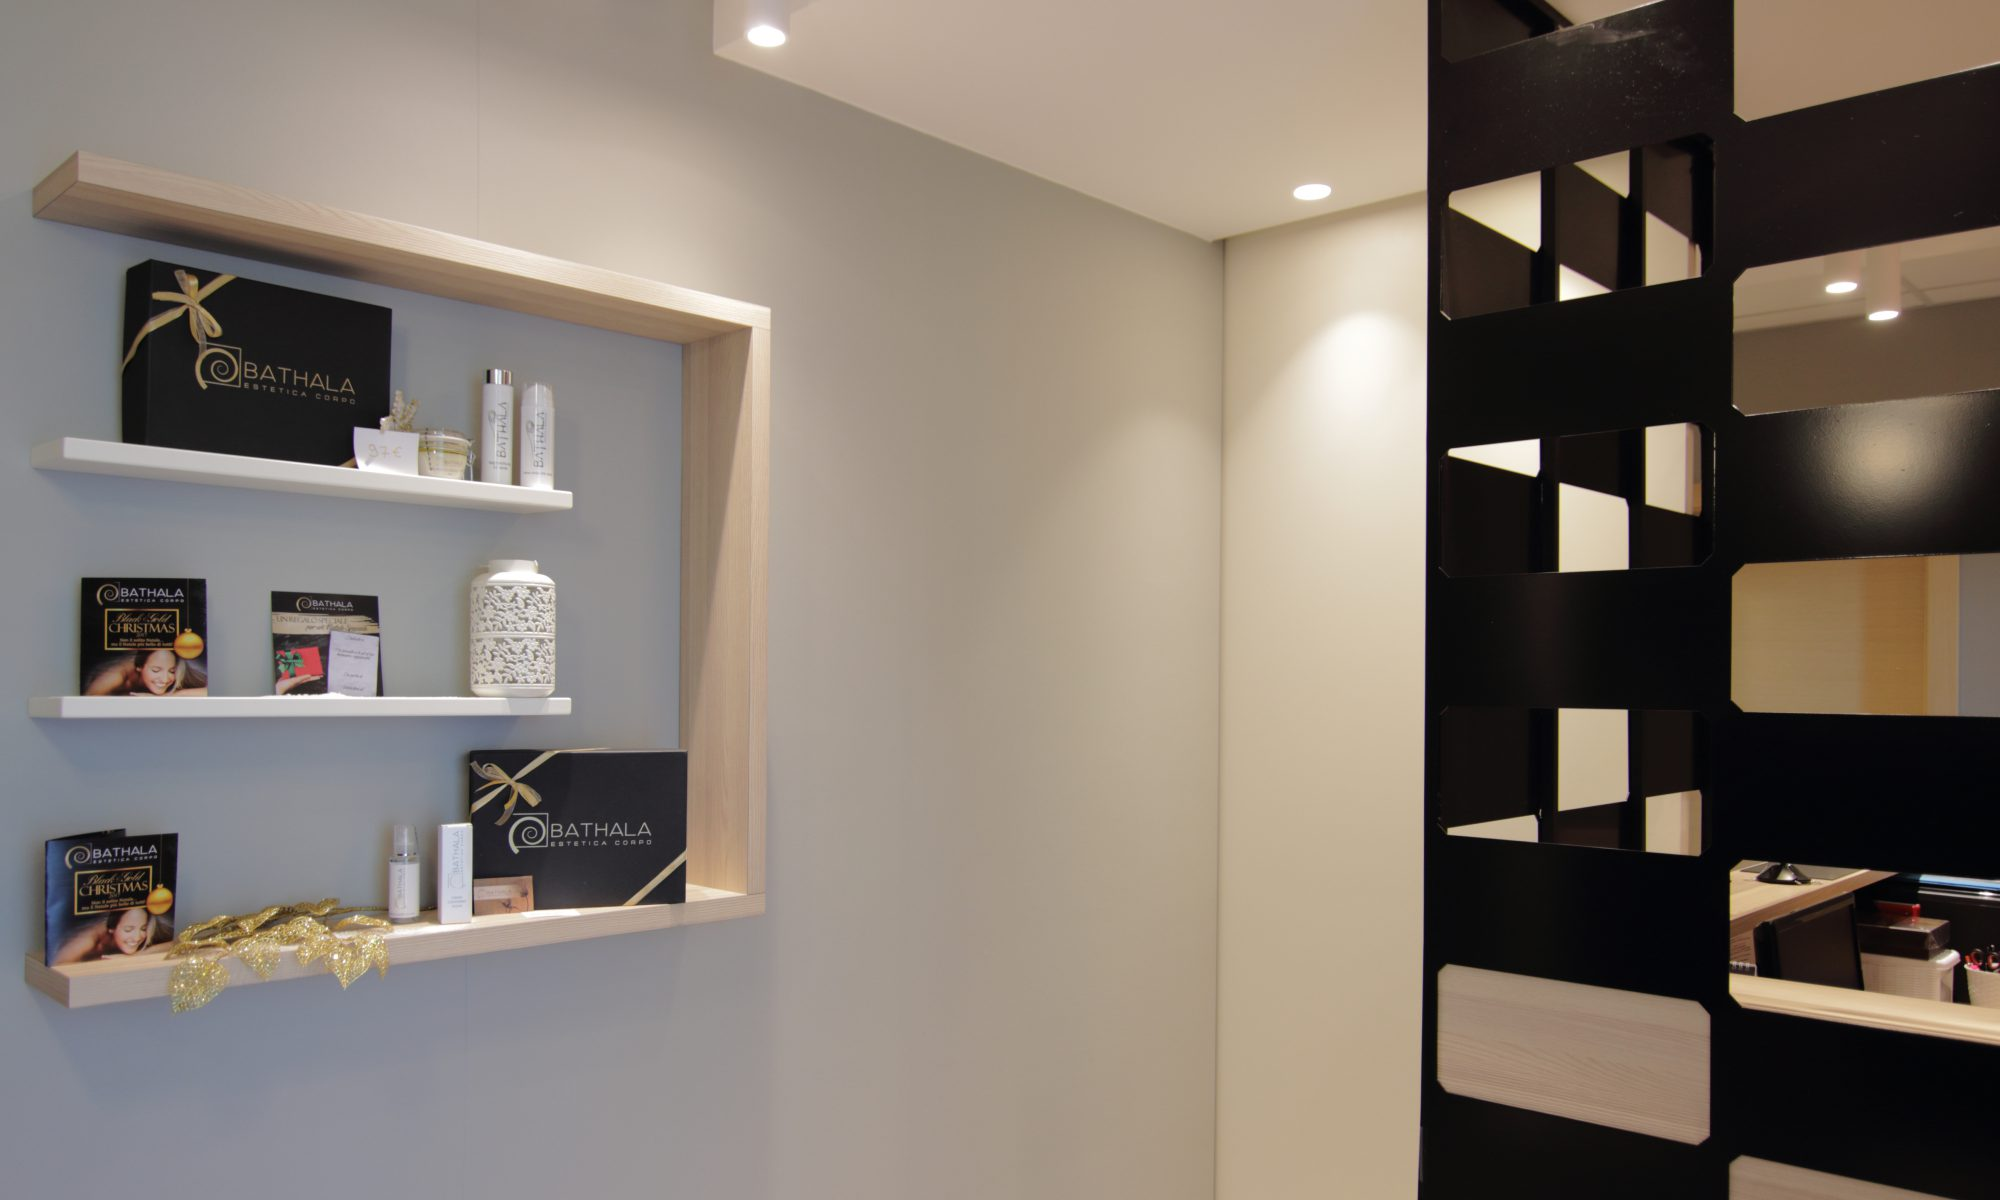 BATHALA centro estetico interior design modena